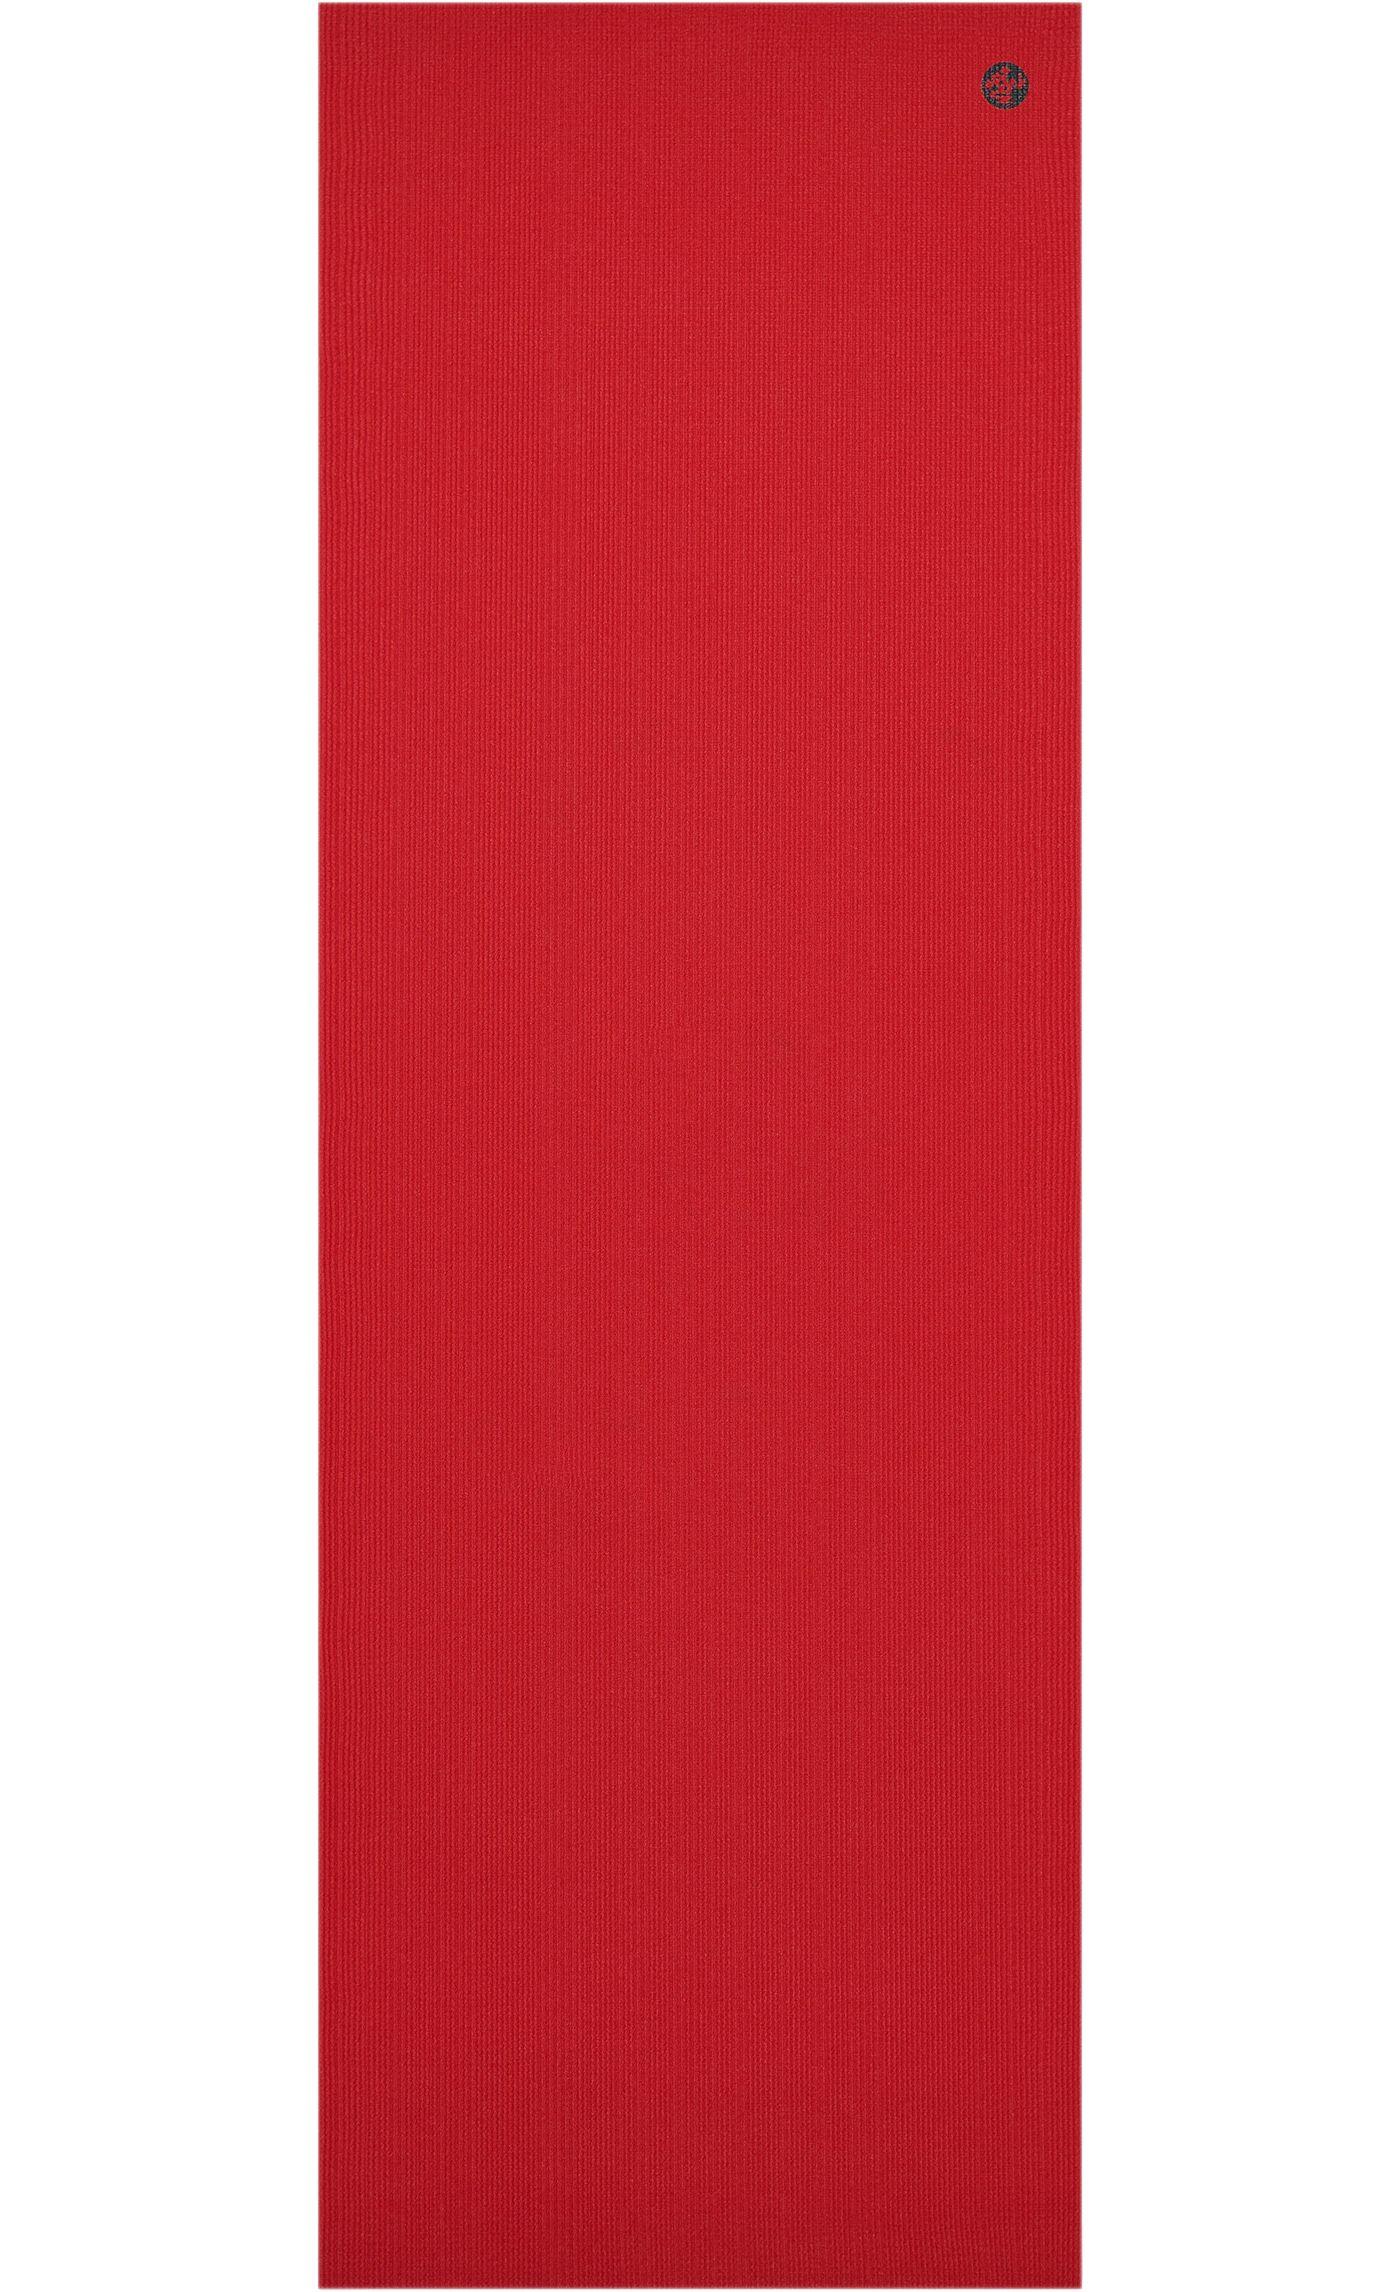 Manduka 5mm PROlite Yoga Mat